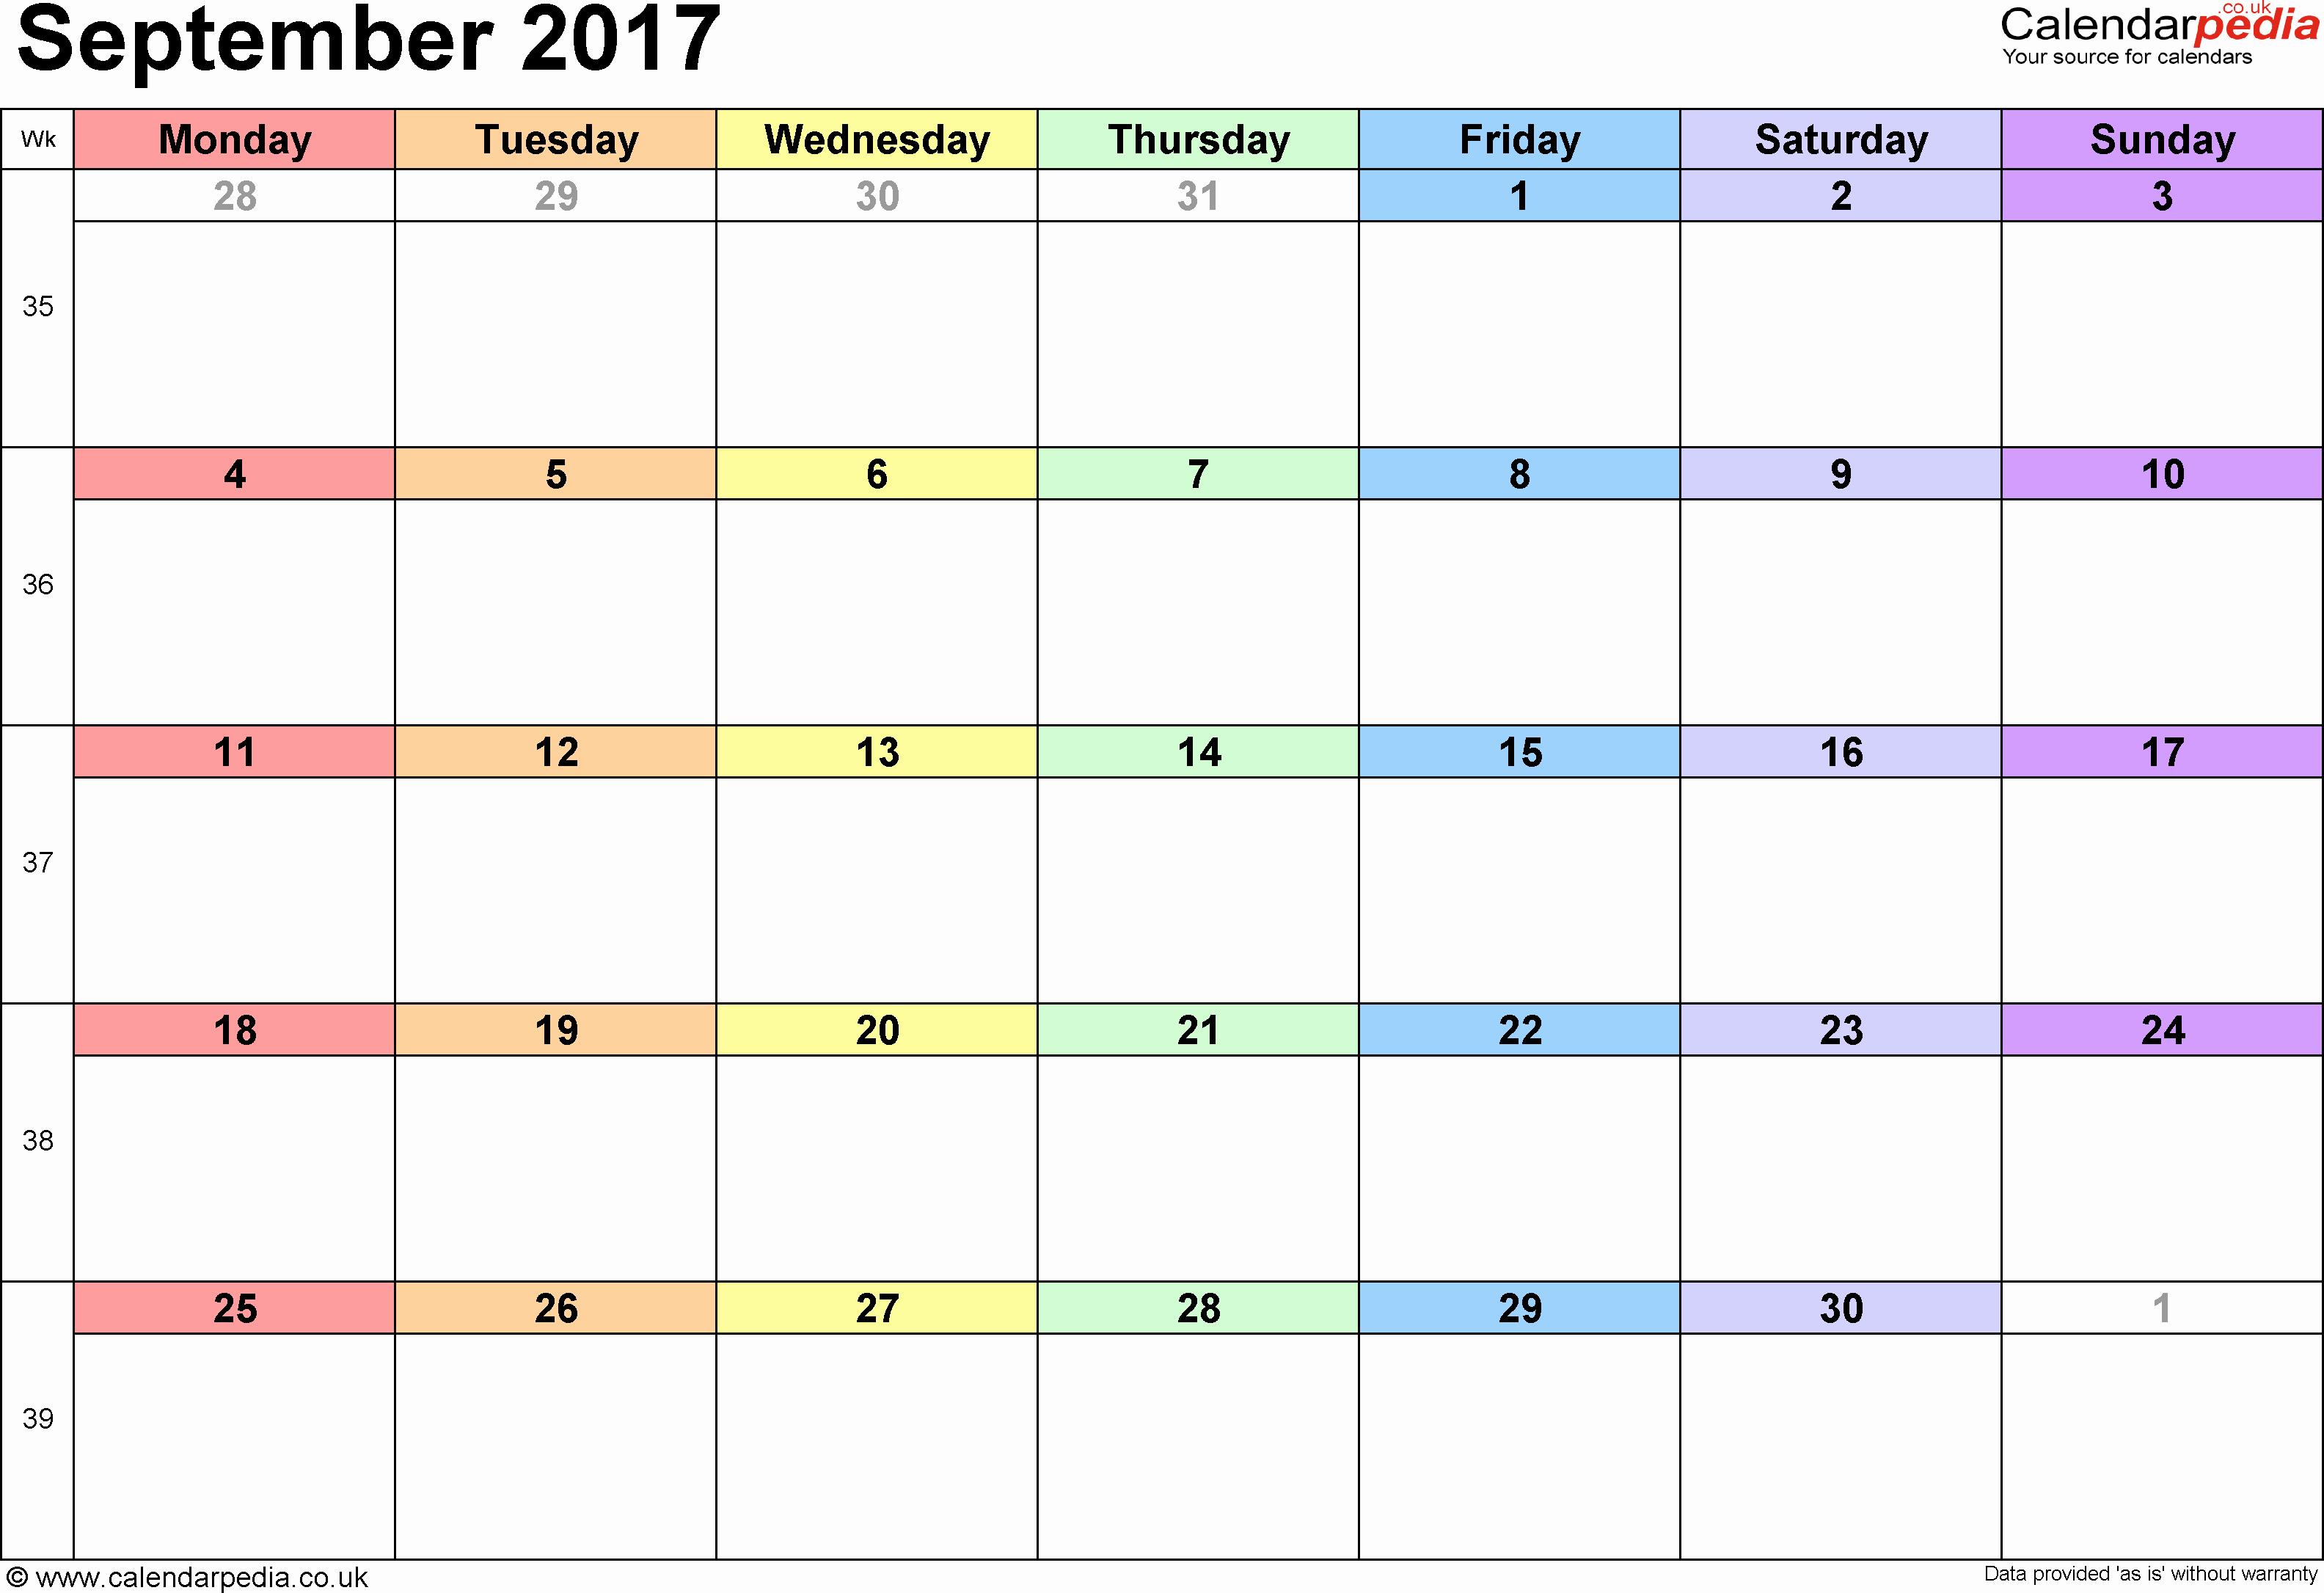 Excel 2017 Calendar with Holidays Fresh September 2017 Calendar Excel